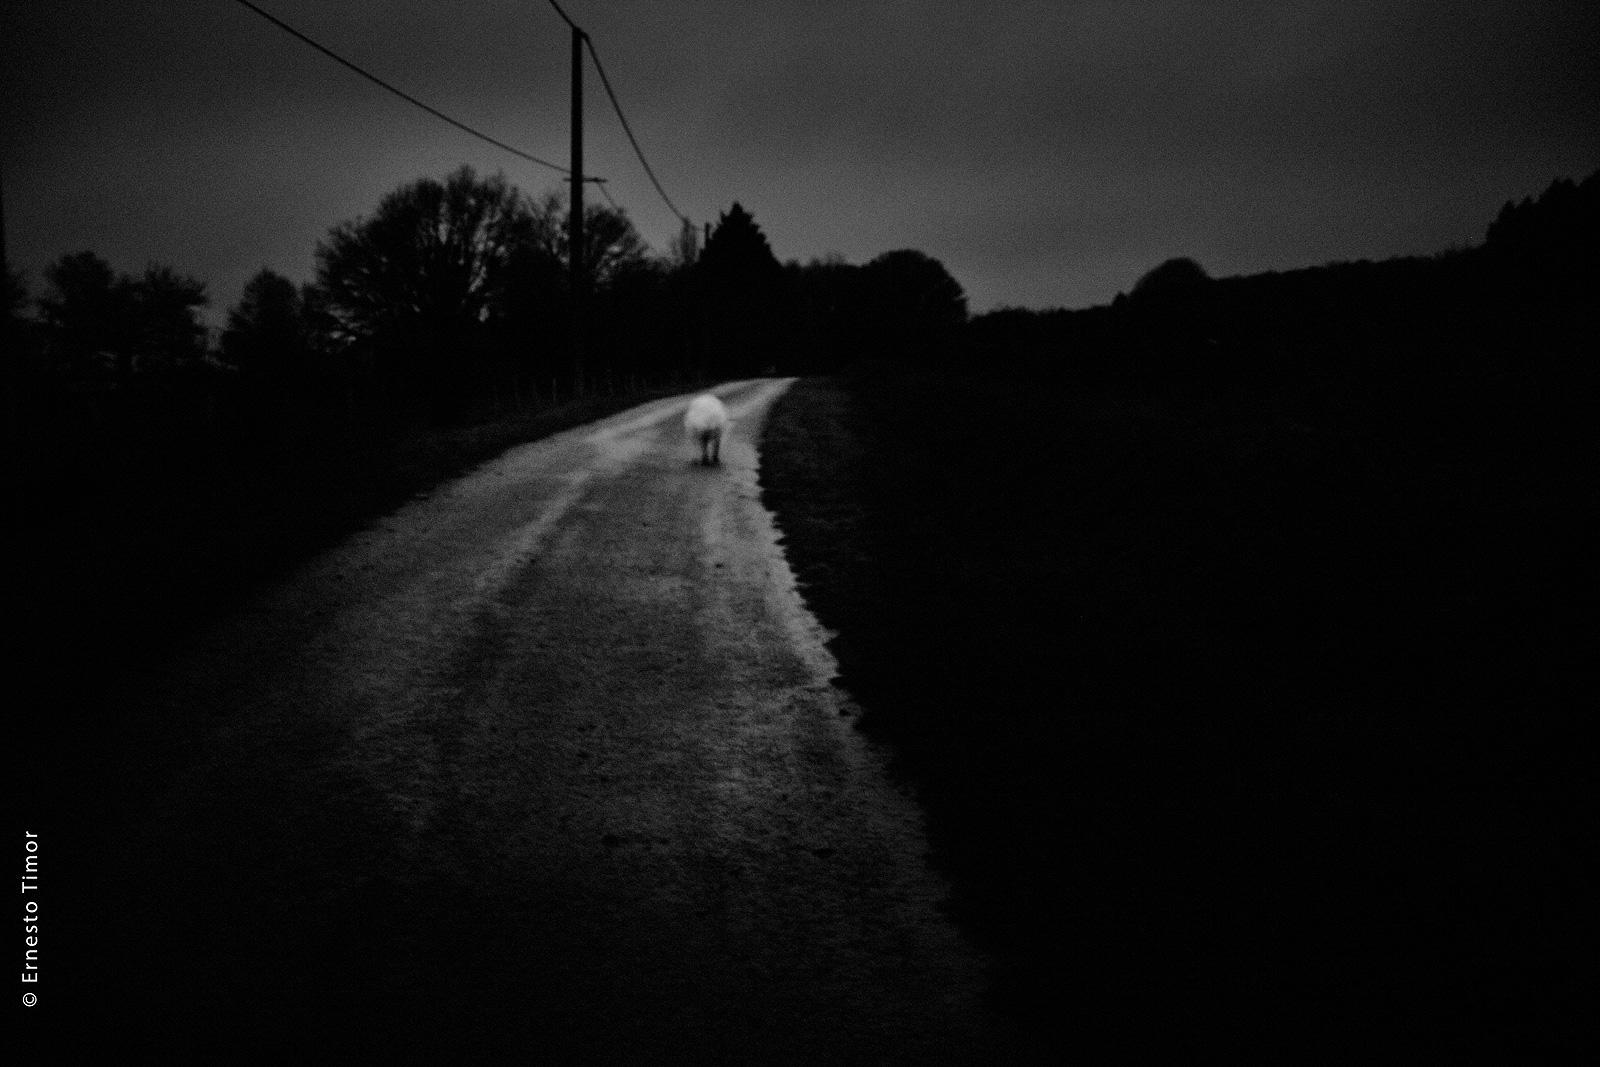 Photo © Ernesto Timor - Nocturne avec bête